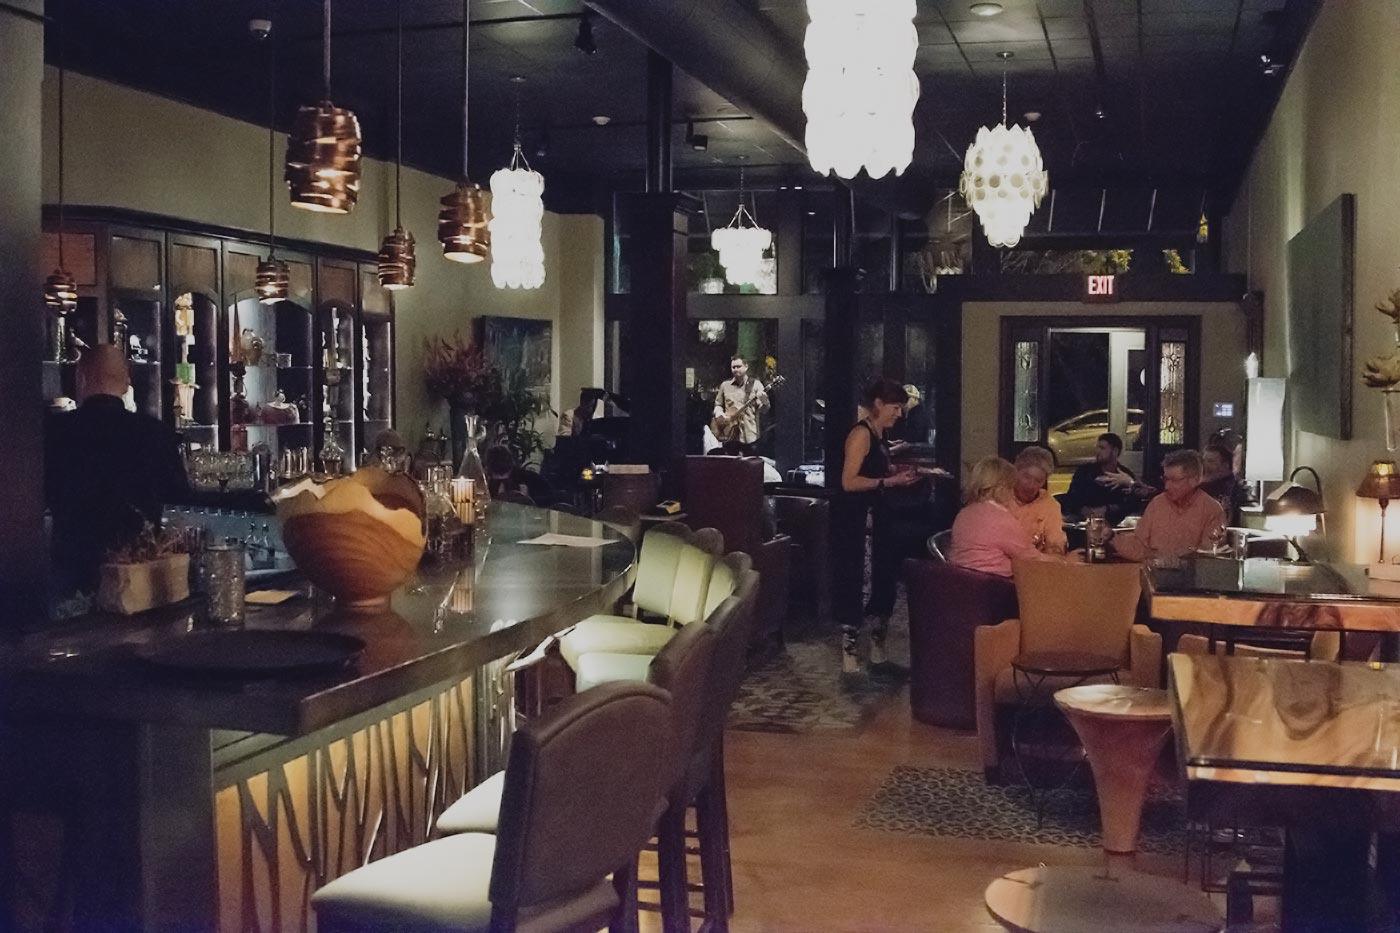 Rainer S Cafe Bar Greenville Sc